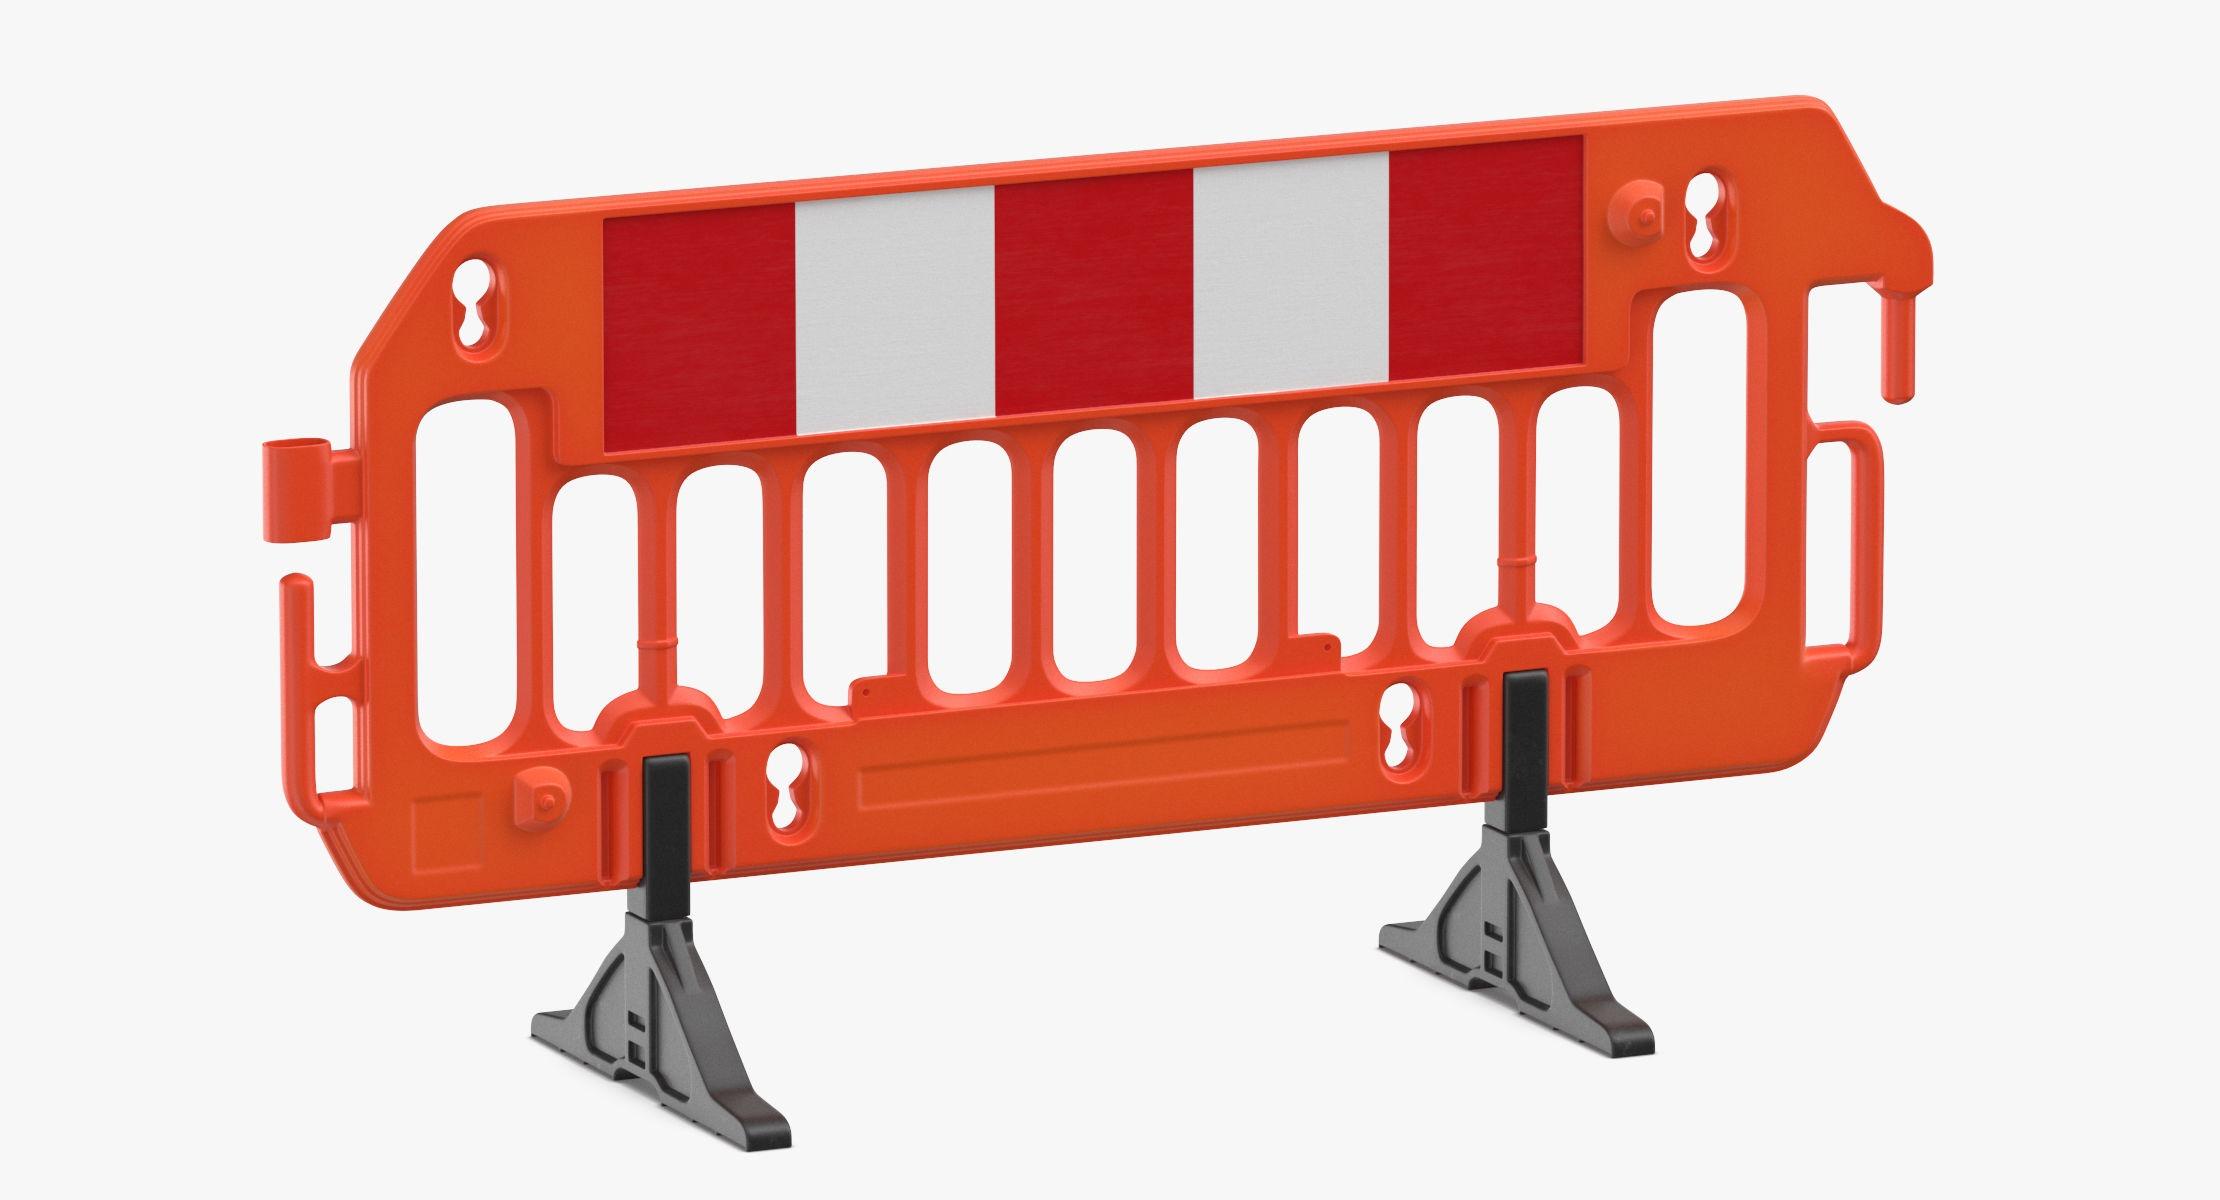 Construction Barrier 01 Orange - reel 1